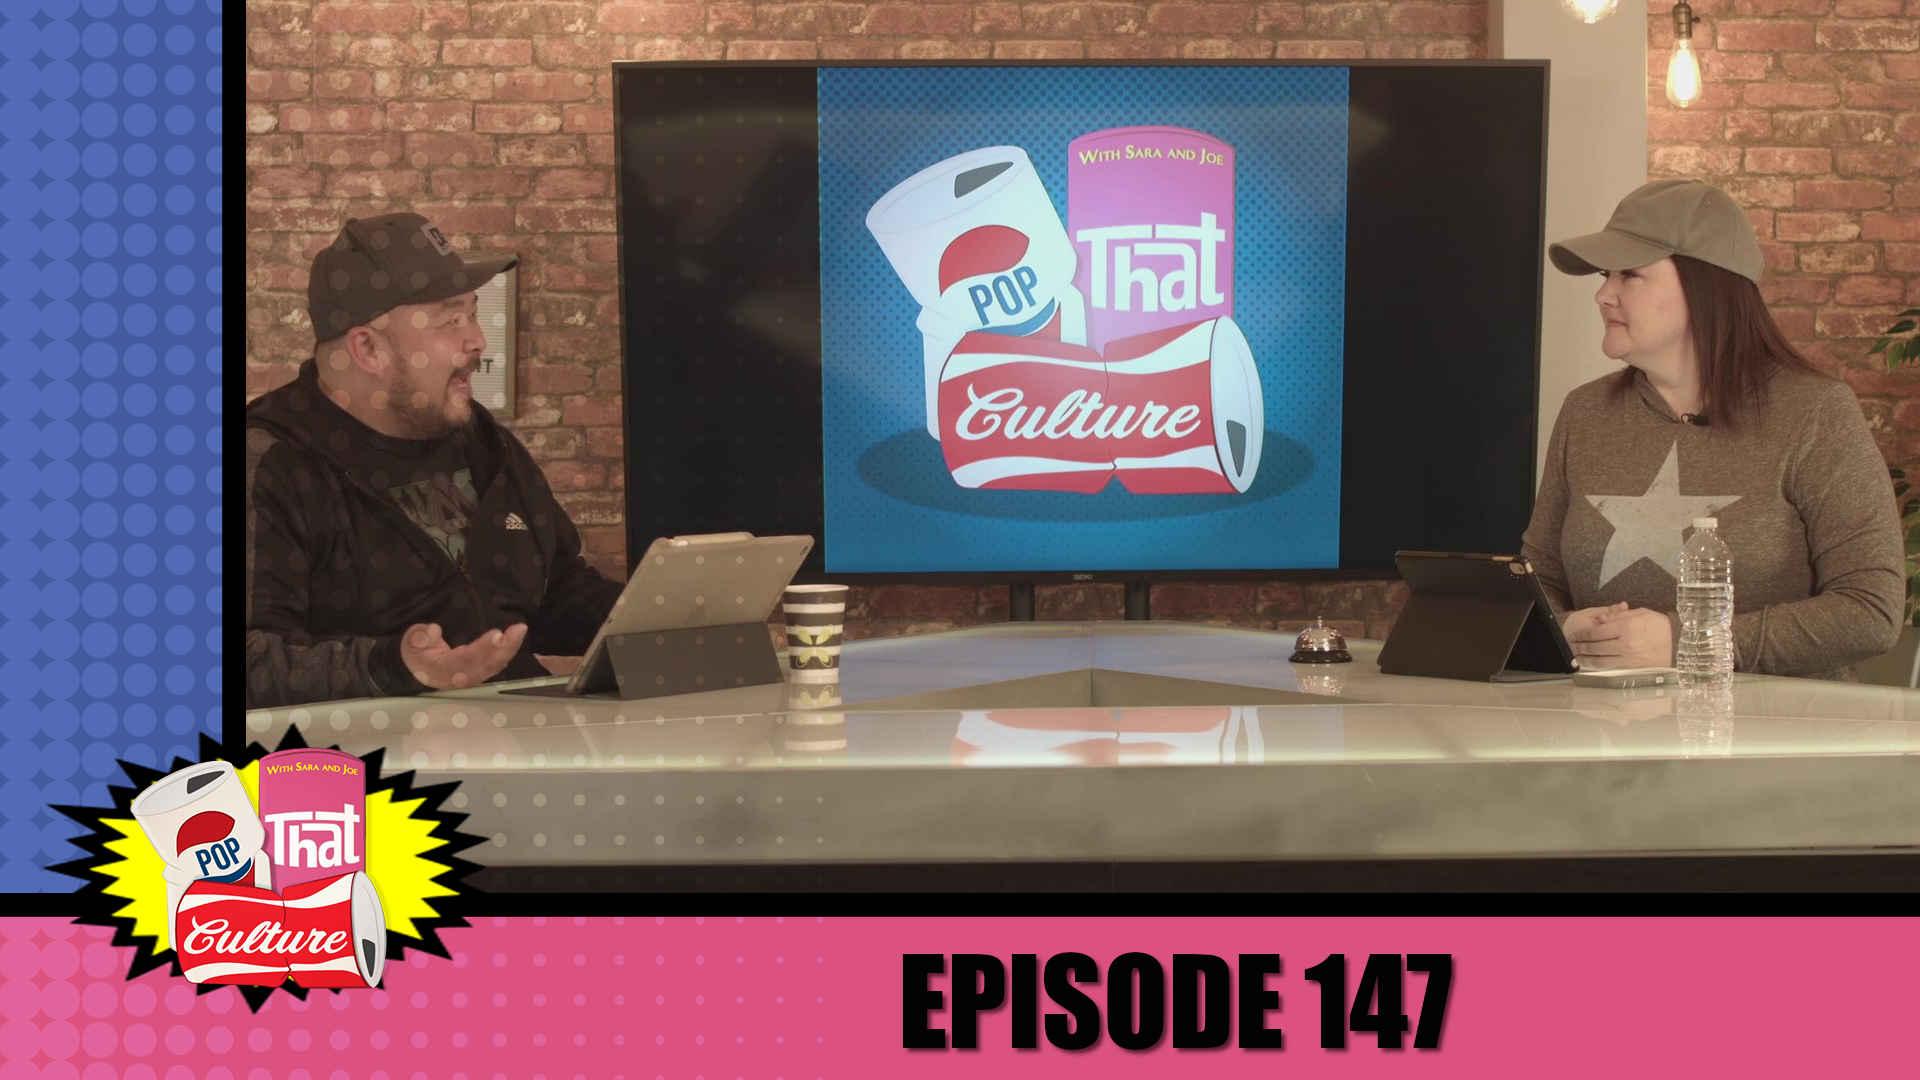 Pop That Culture - Episode 147